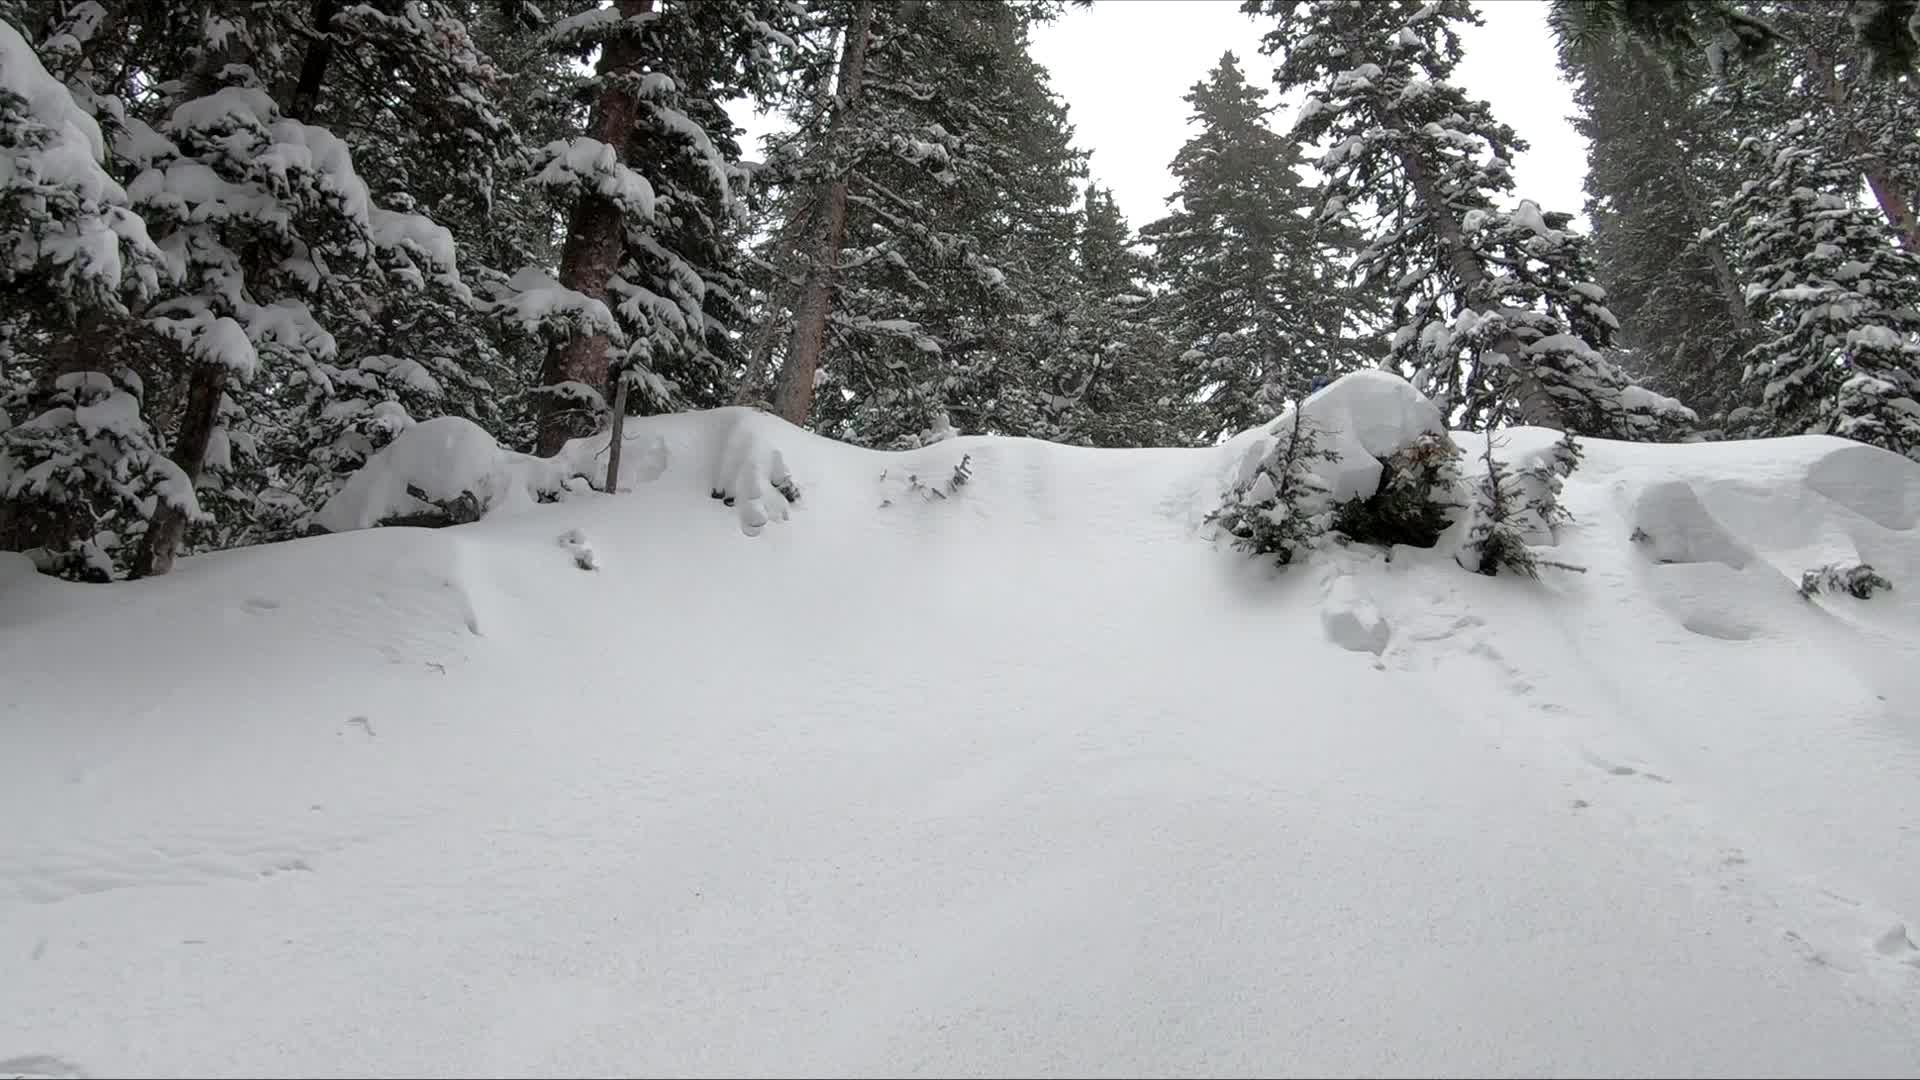 snow, snowboard, snowboarding, snowing,  GIFs